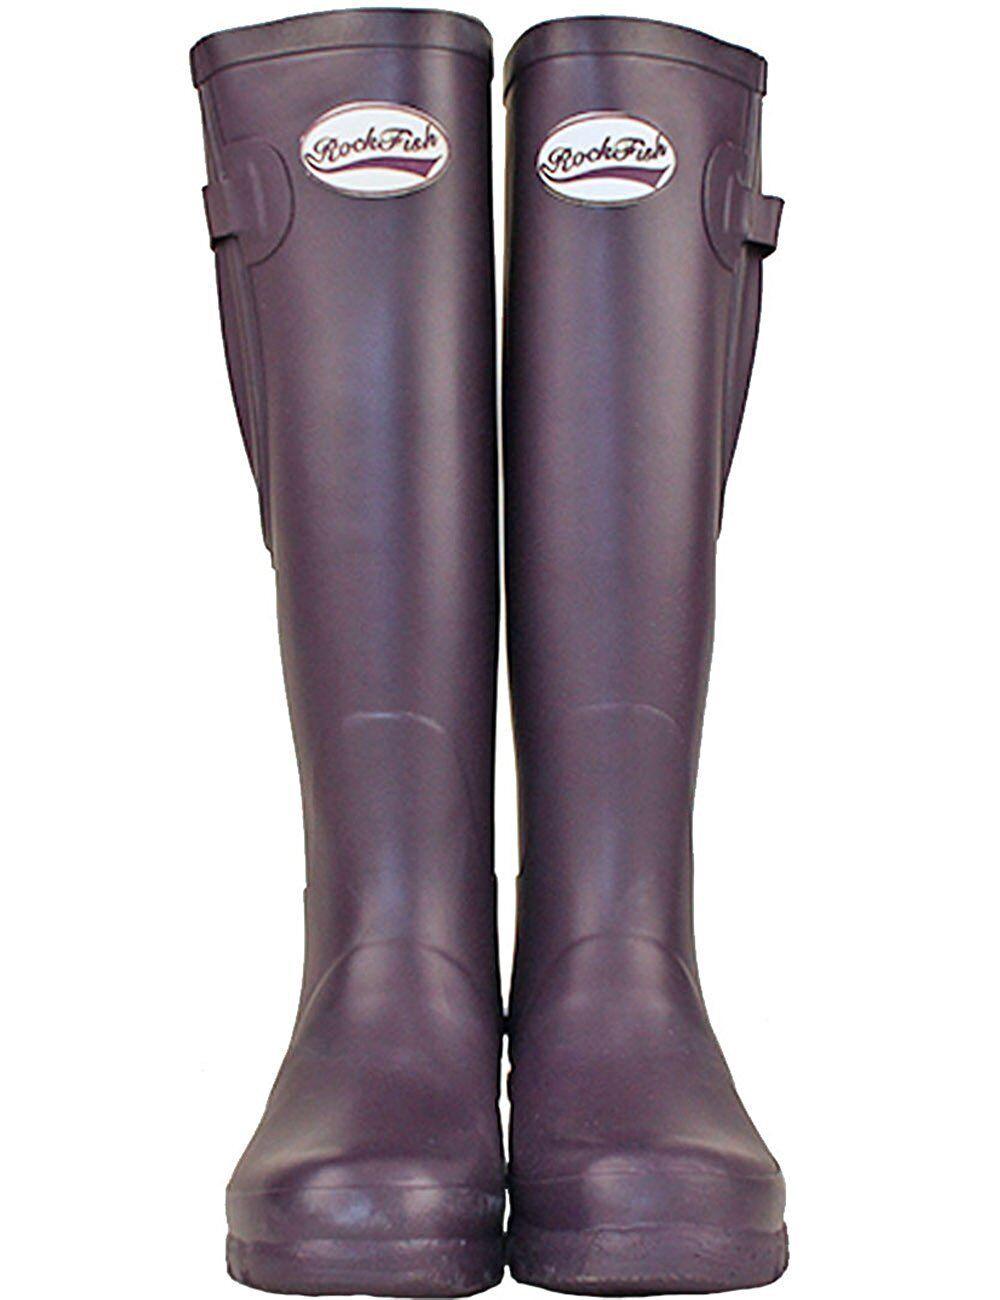 Rockfish Wellington Tall Mat   rfwb 1011 PE violet femmes Taille 5 - 8